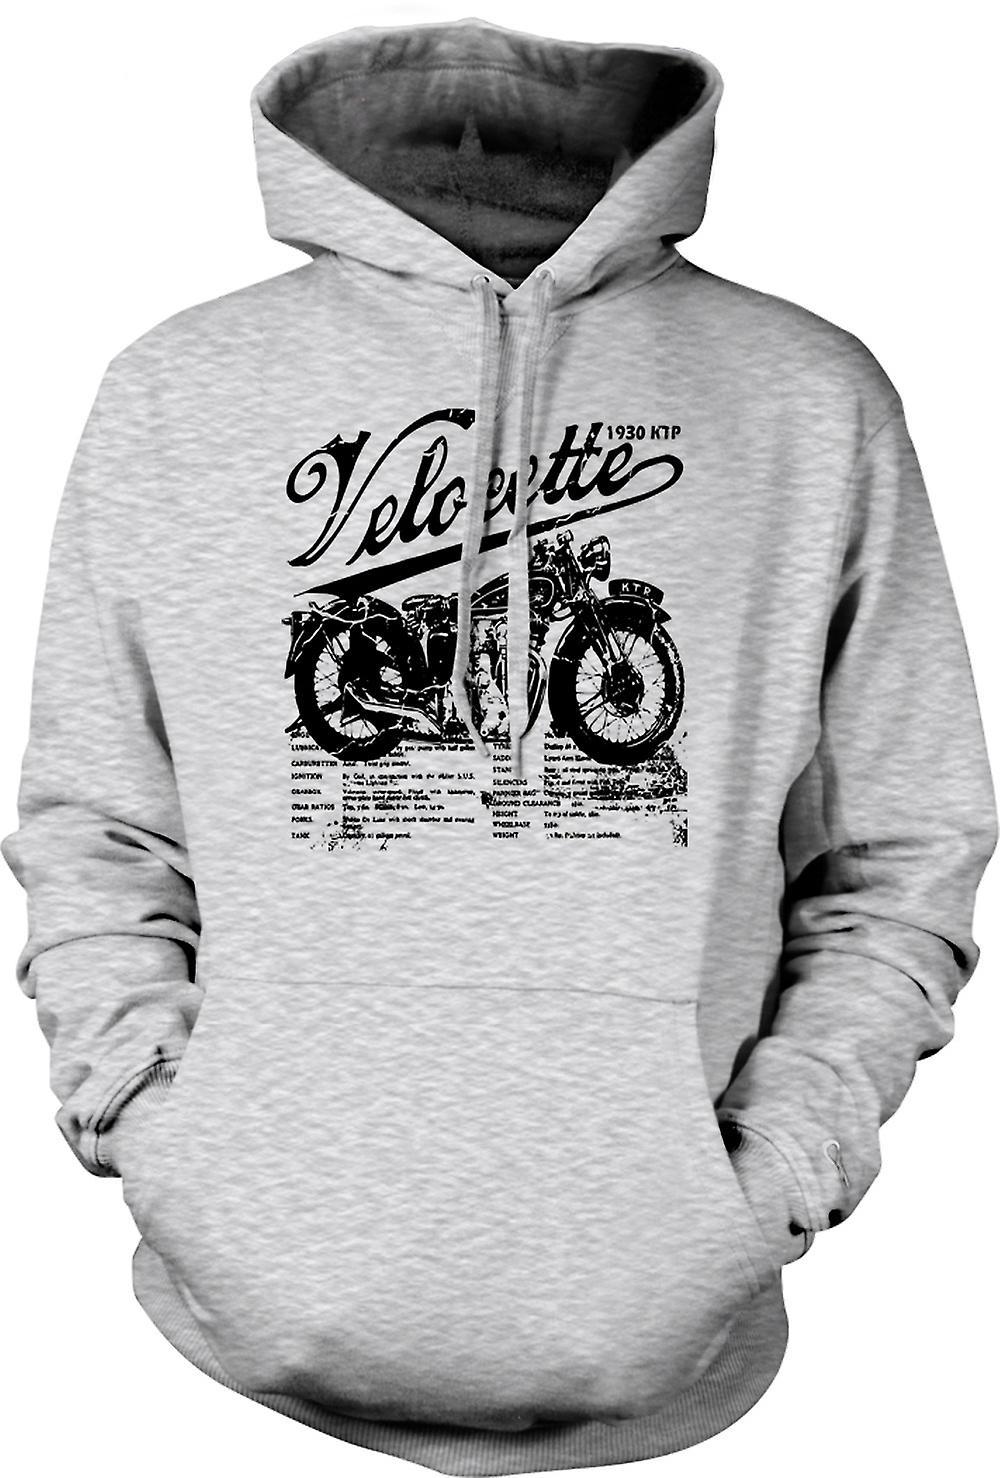 Bicicleta clásica para hombre con capucha - Velocette KTP 1930-